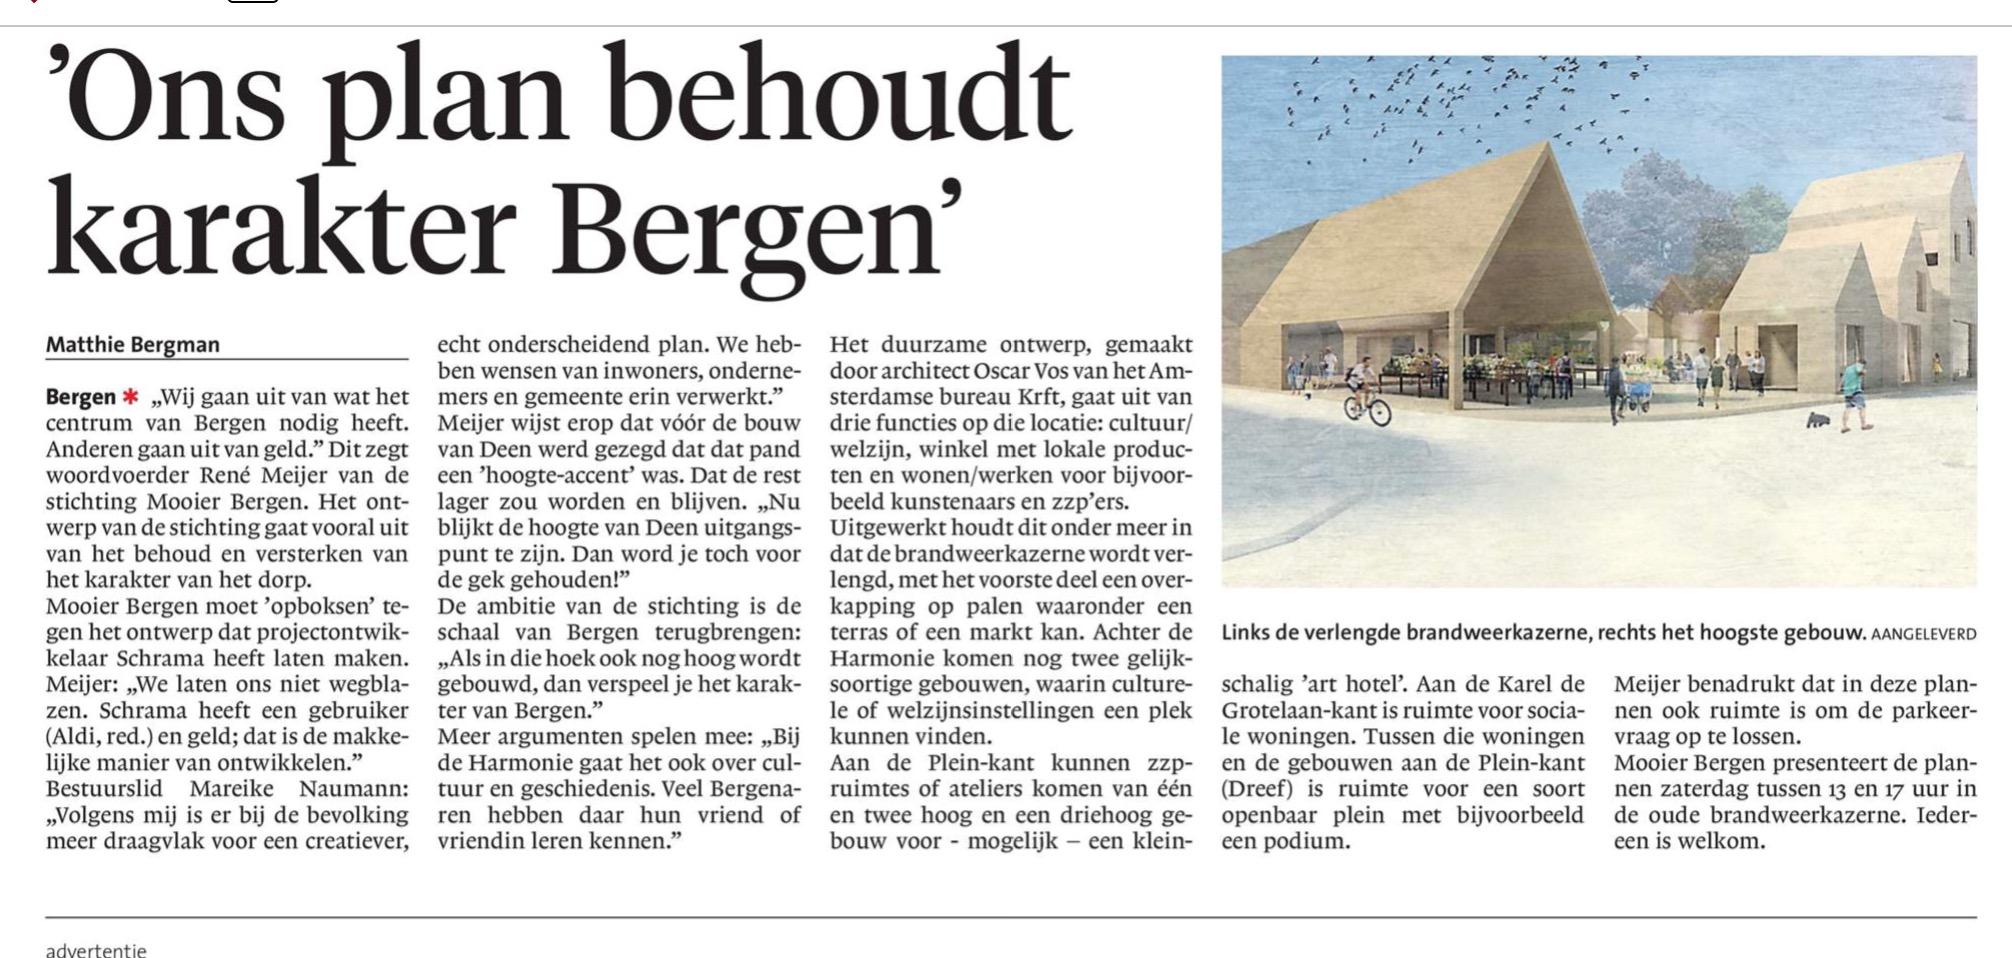 Ons plan behoud karakter Bergen